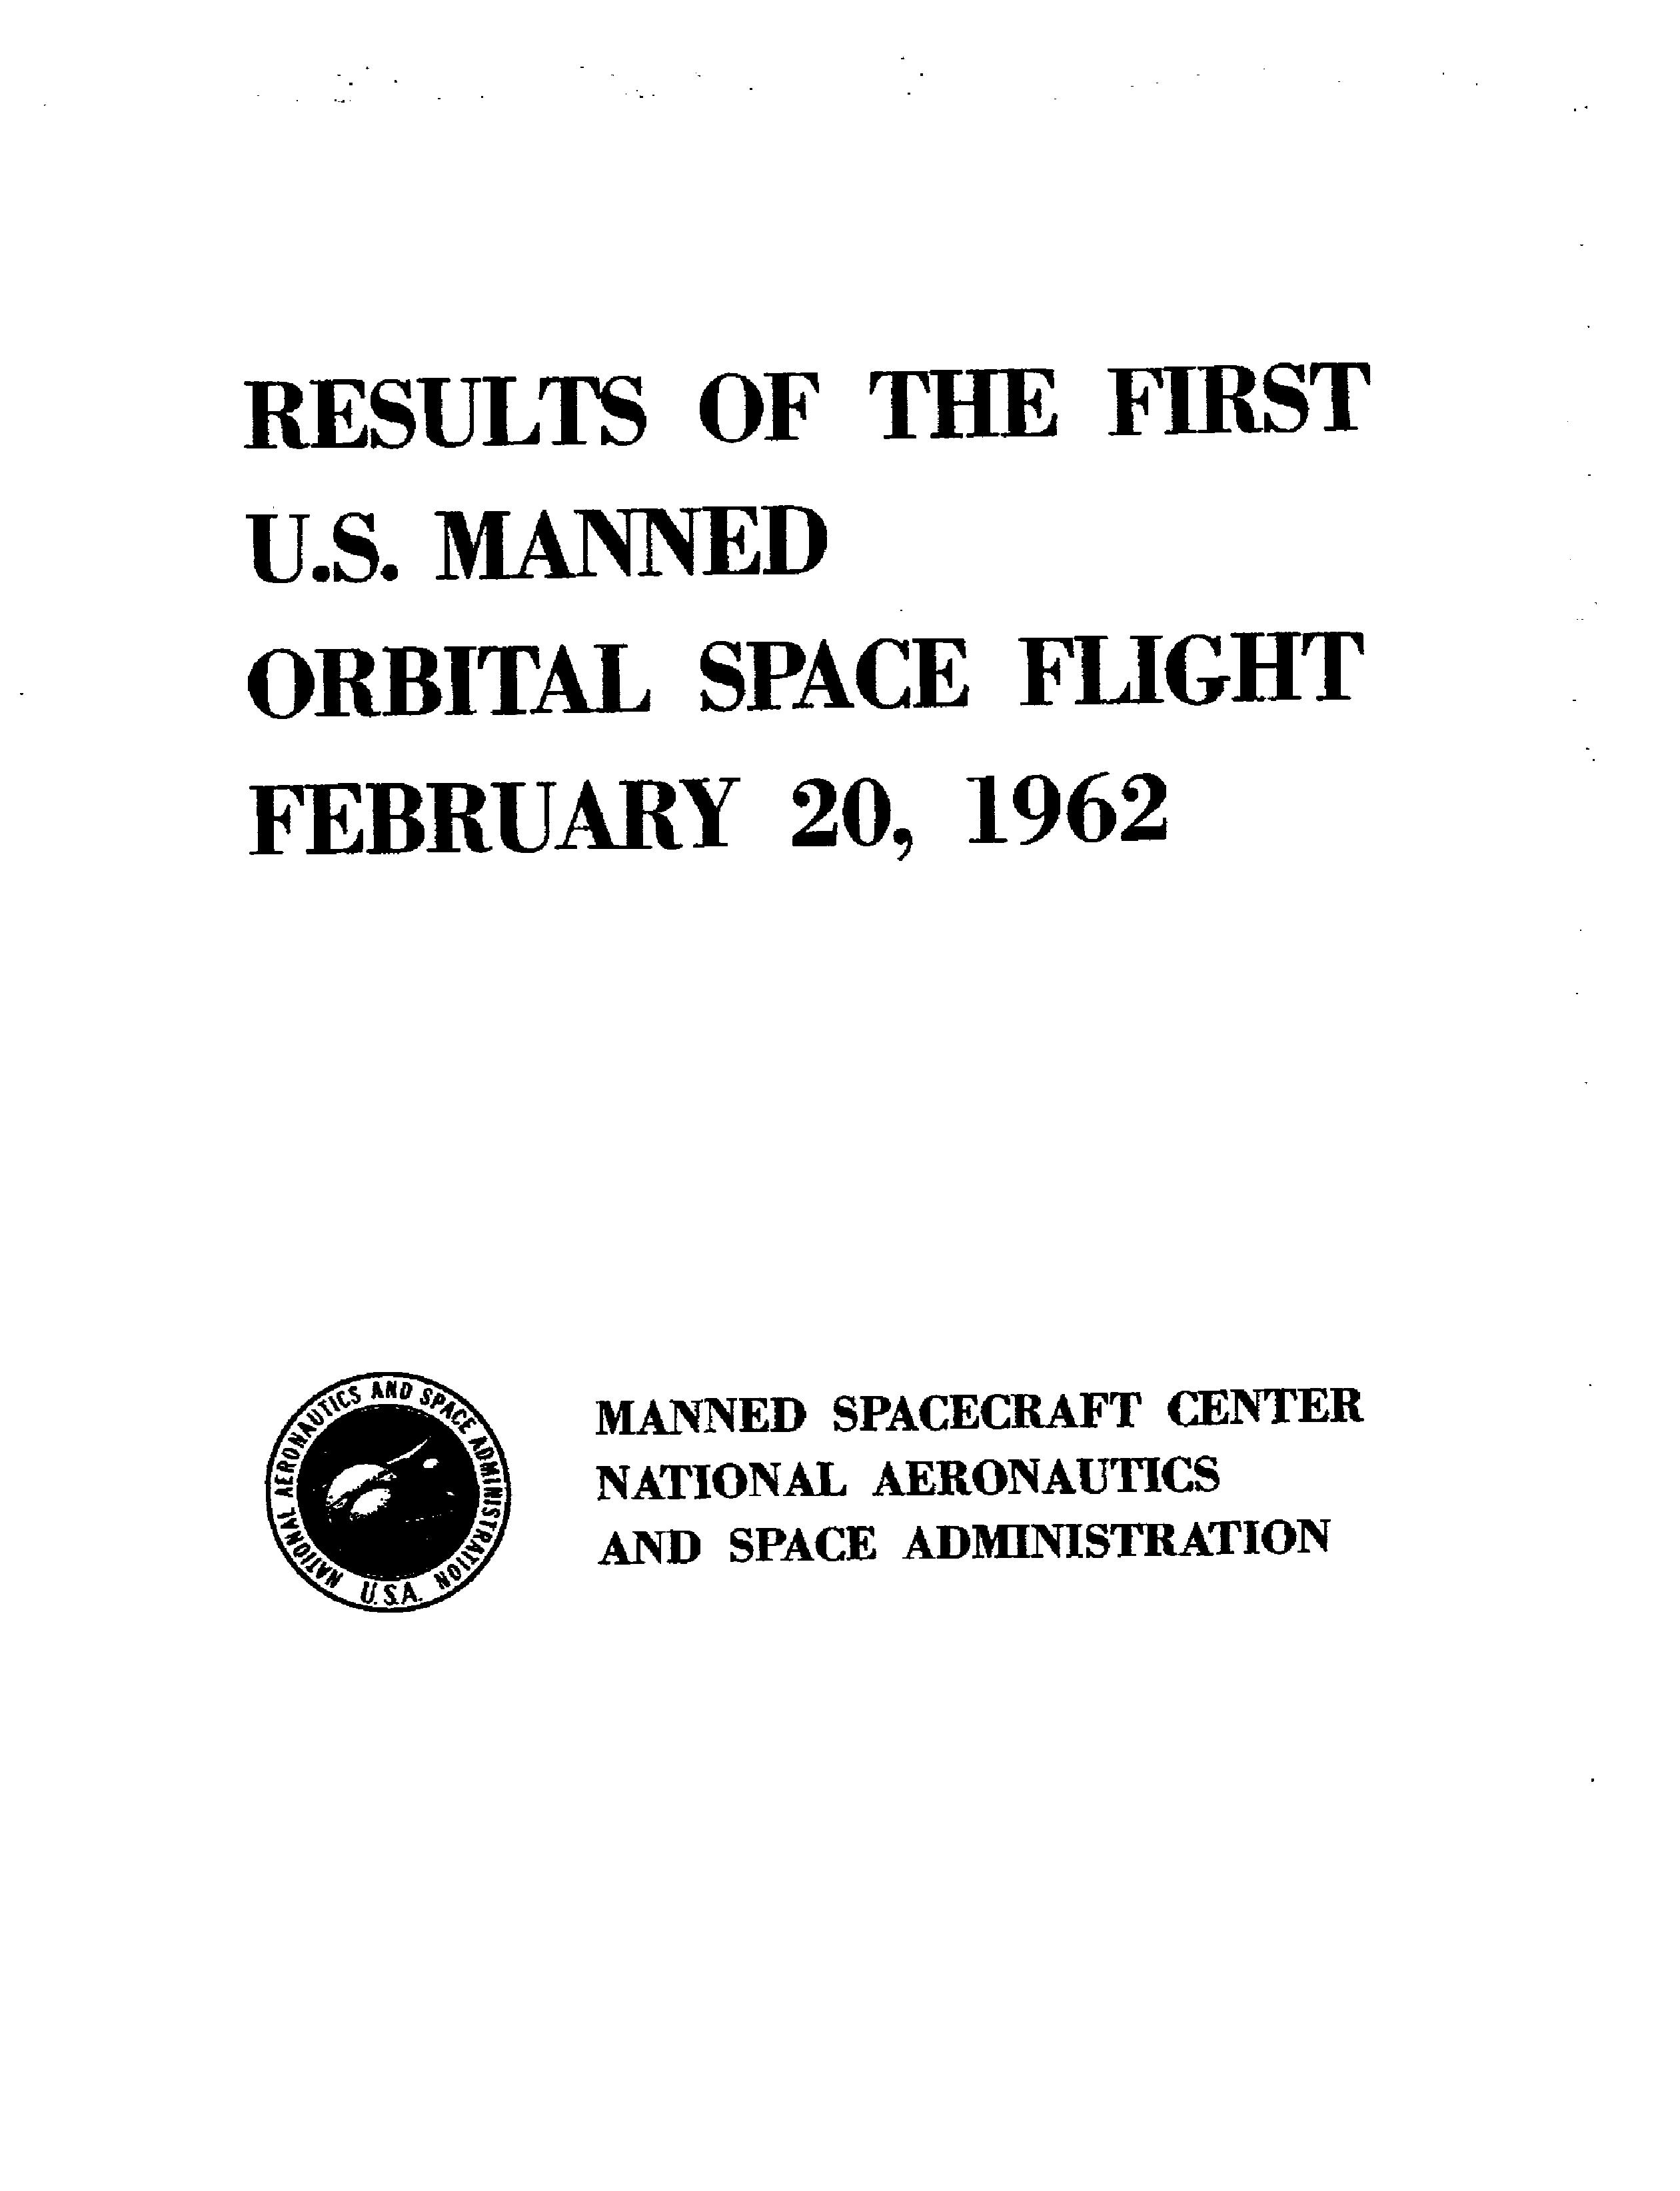 Page 2 of Mercury 6's original transcript